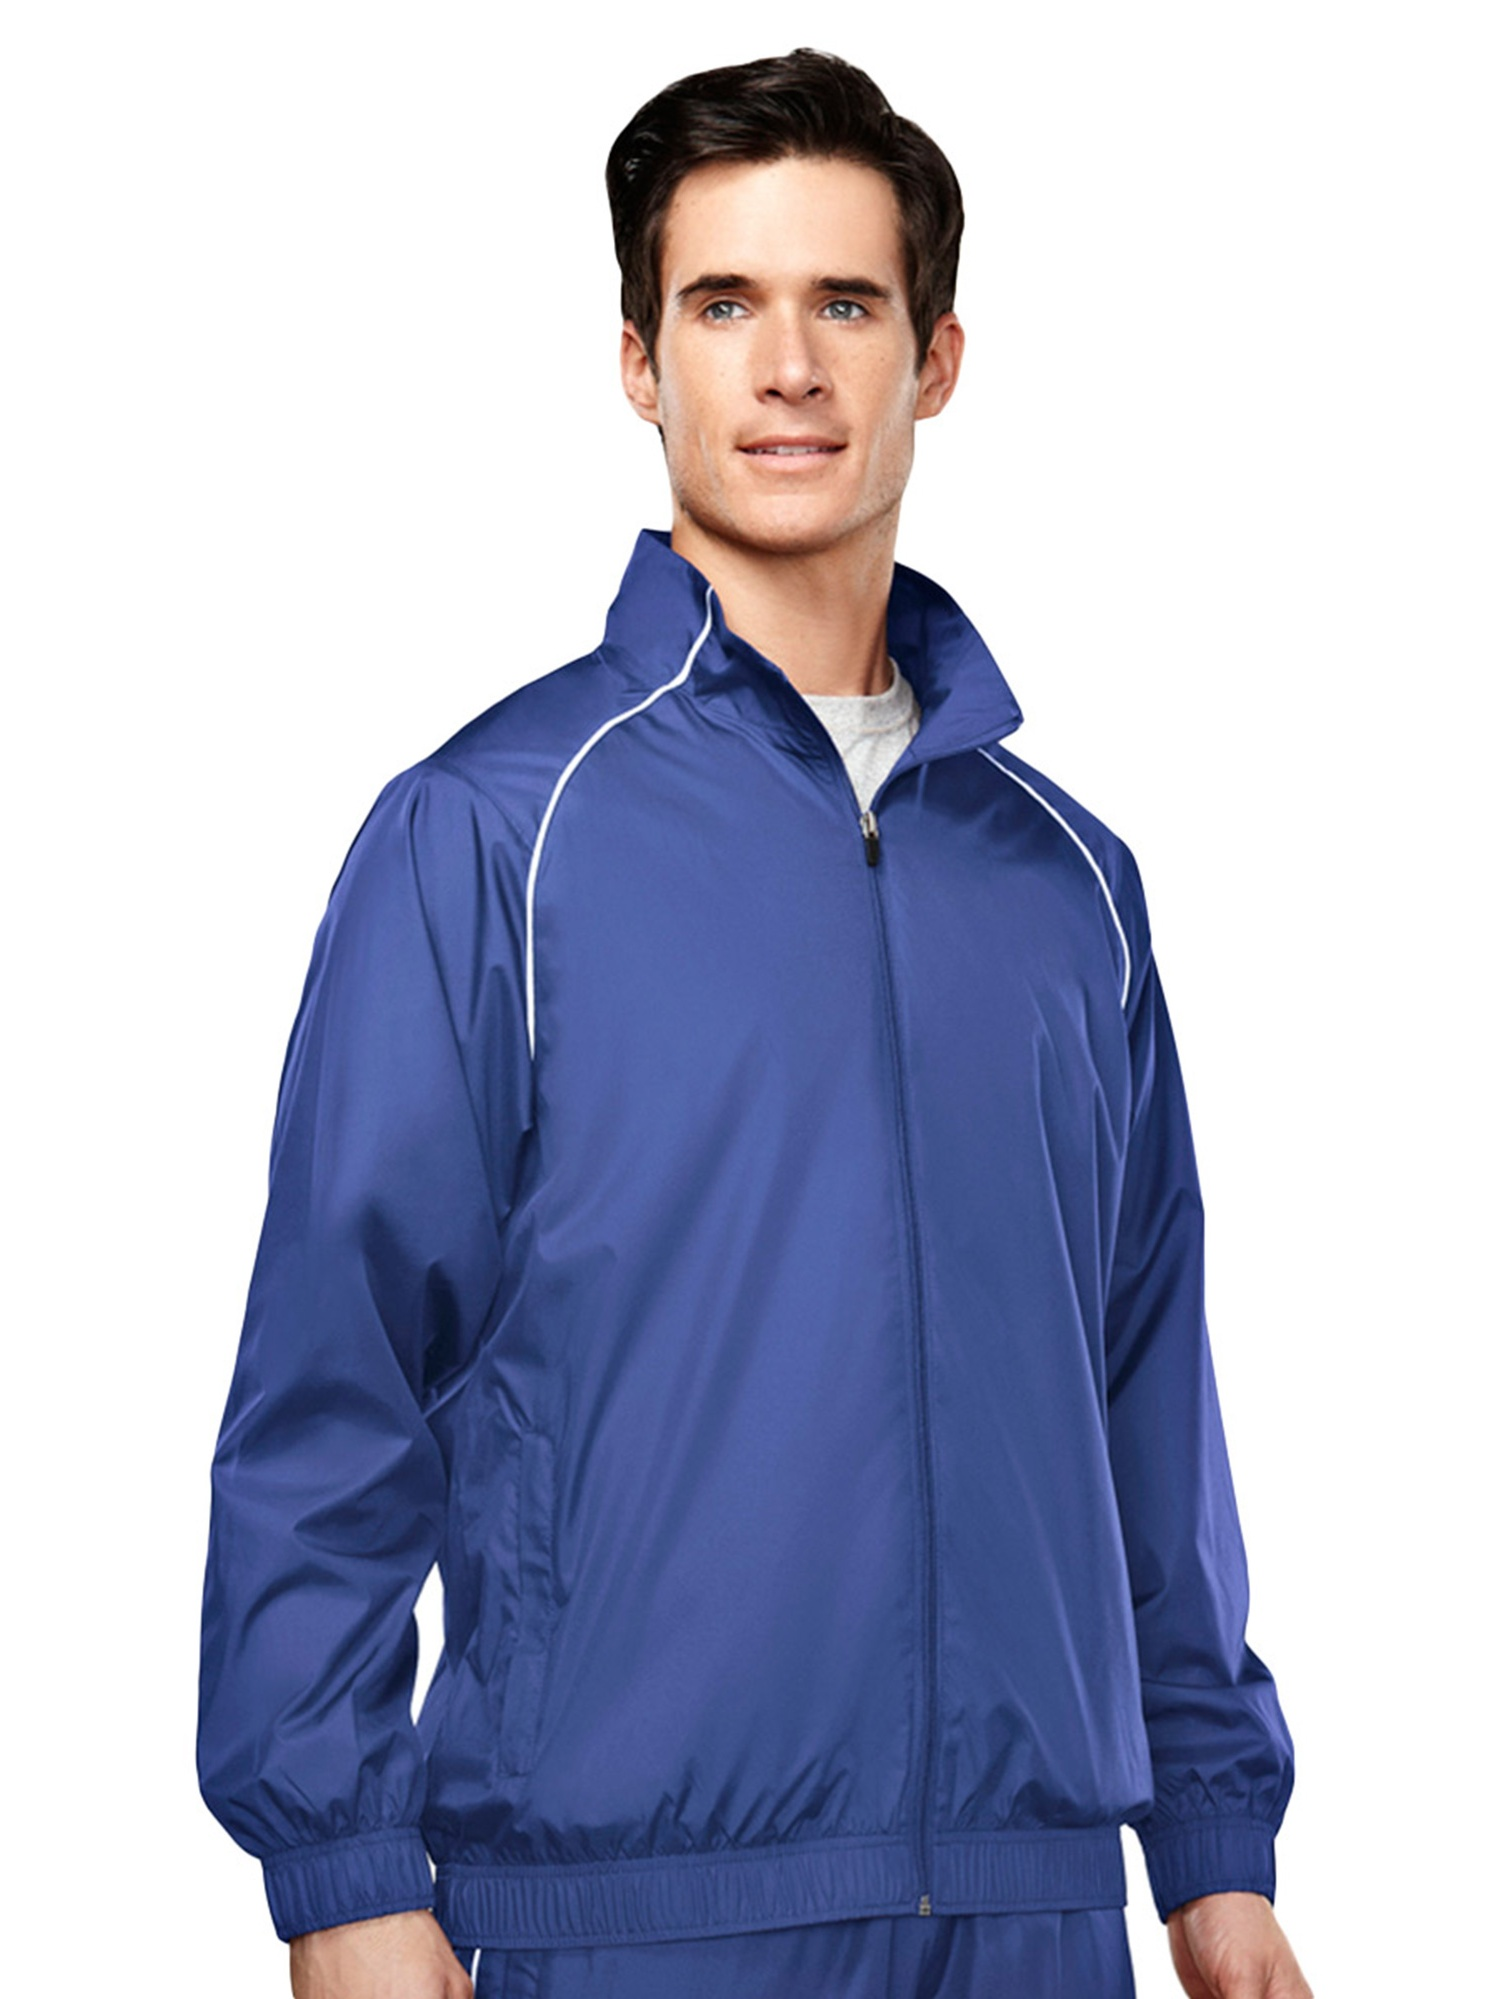 Tri-Mountain Men's Lightweight Water Resistant Sport Jacket